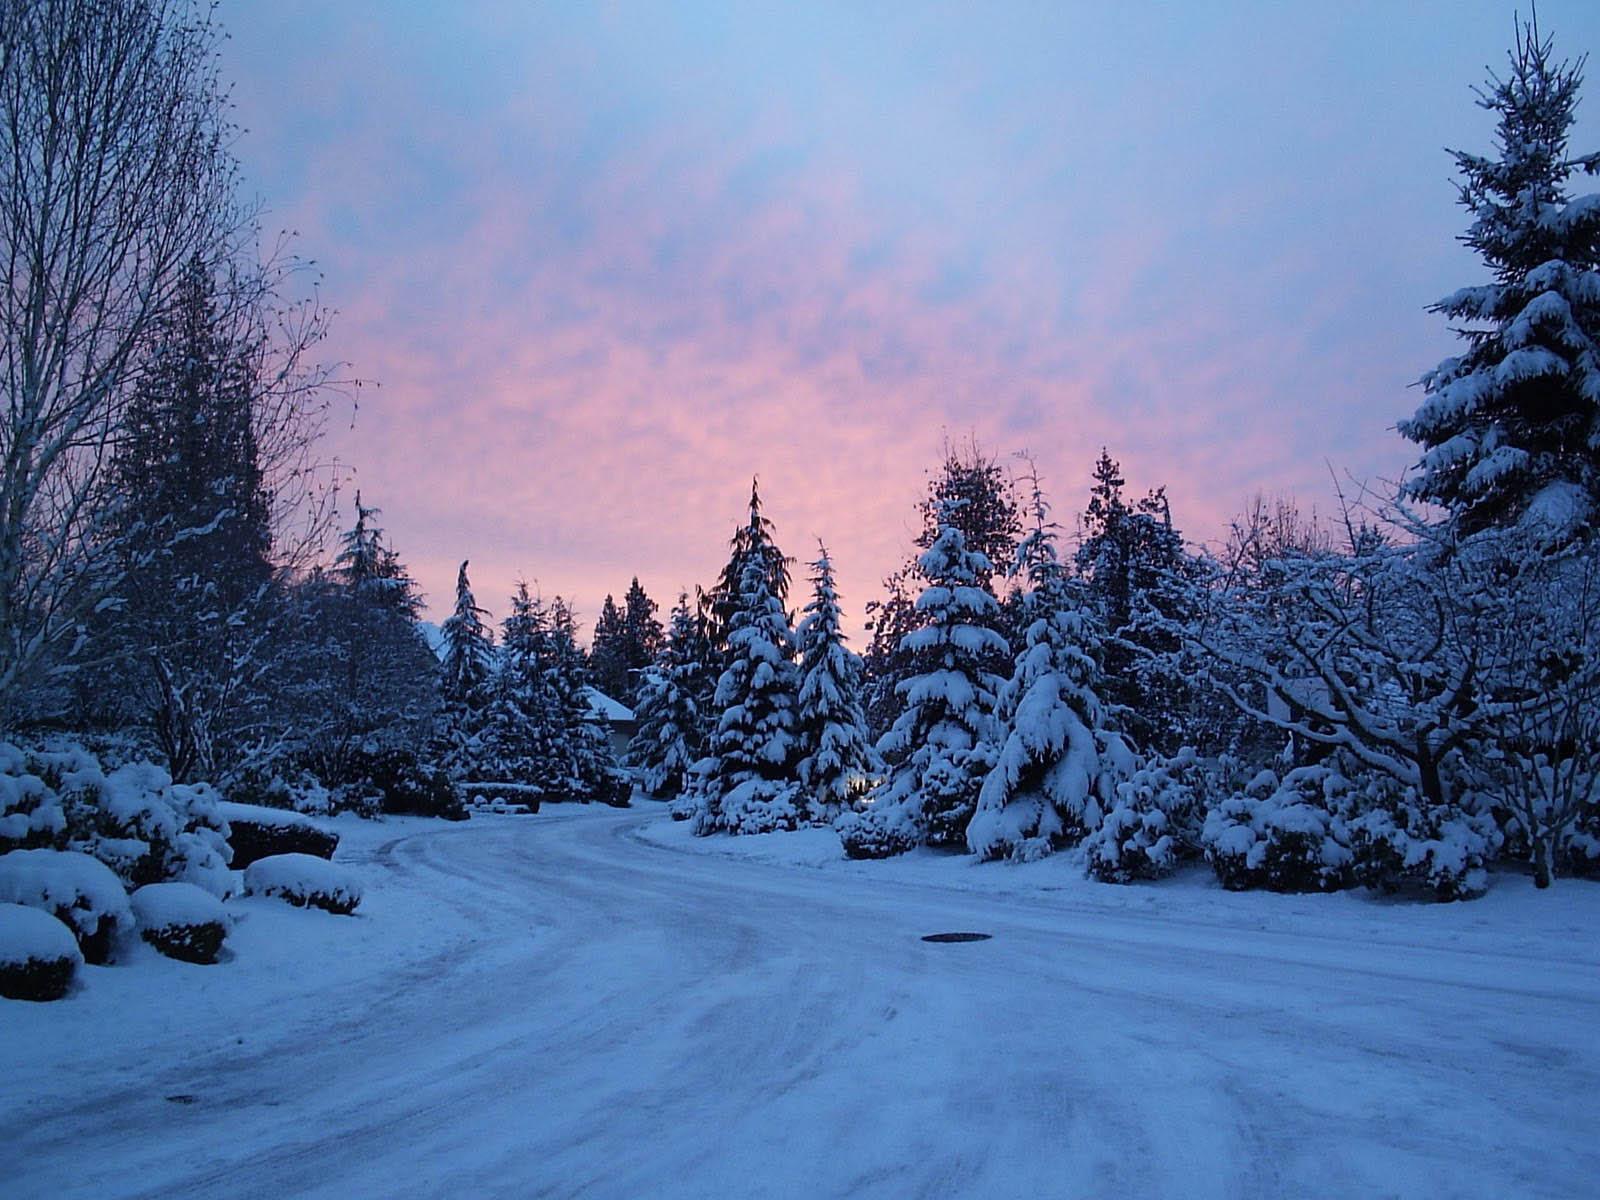 Rocky Mountain Winter Search Results Page 15 EskiPaper 1600x1200